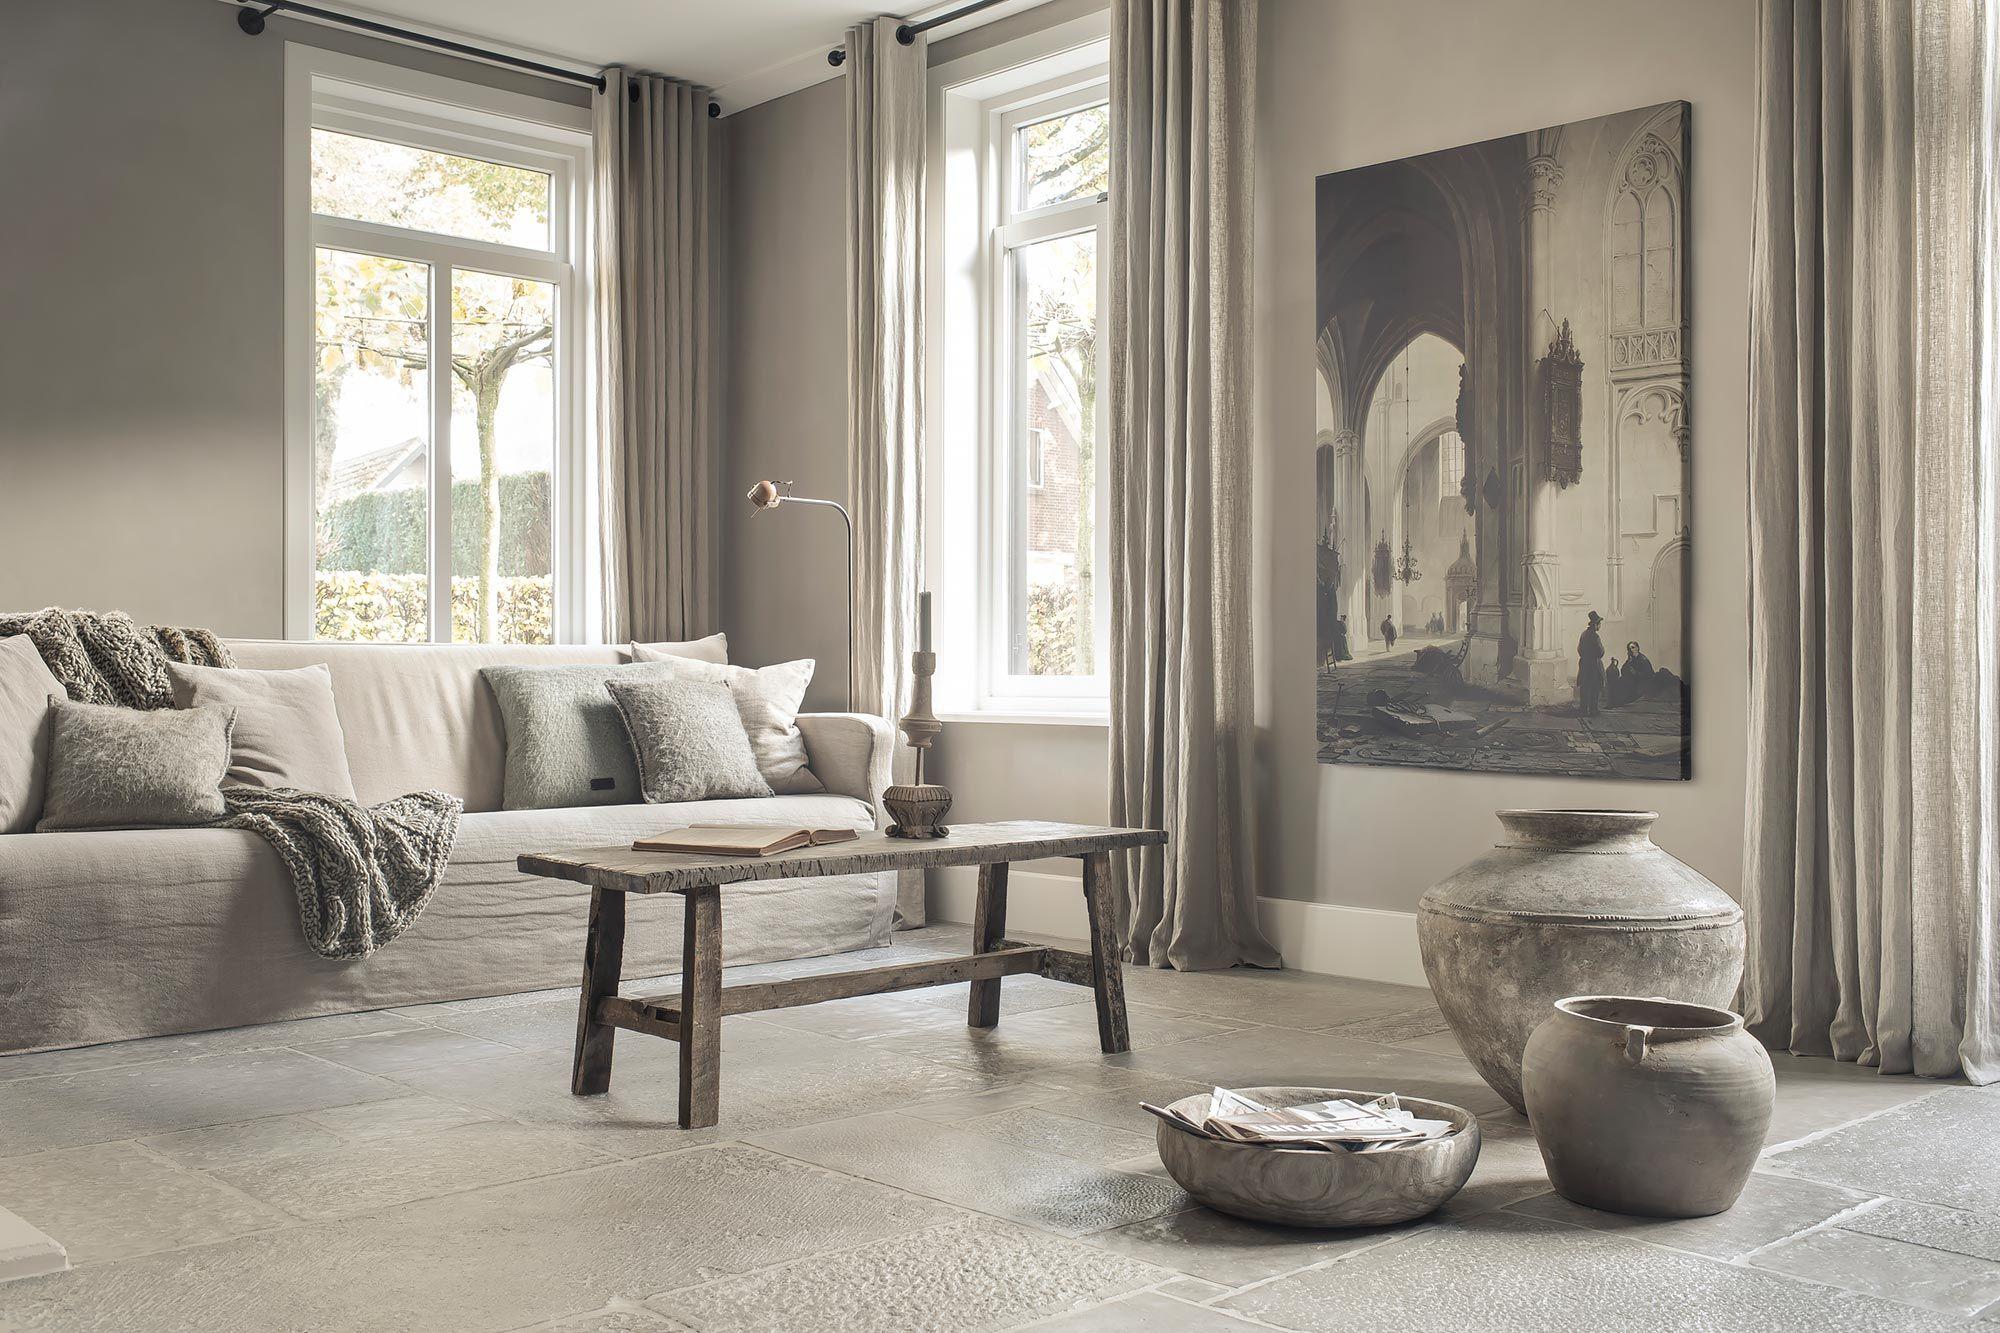 Hoffz interieur stenen vloer hollandse meesters pinterest living rooms for Home decoration meester